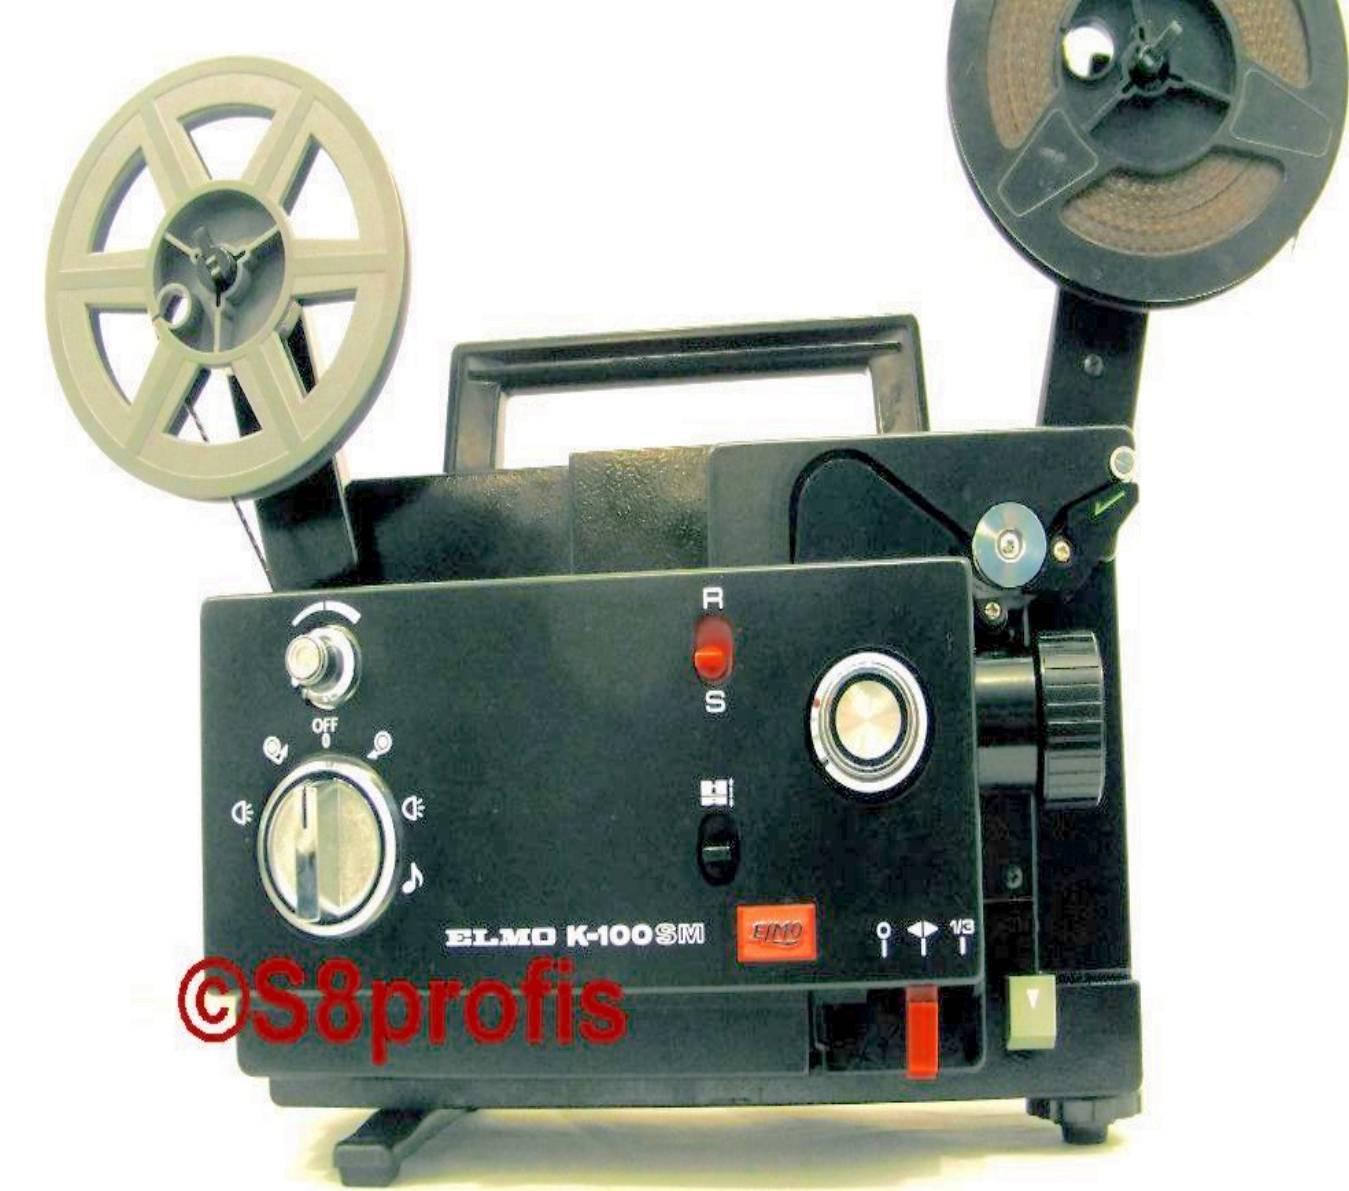 s8profis user manual elmo k 100 sm rh s8profis de  elmo k100sm projector manual